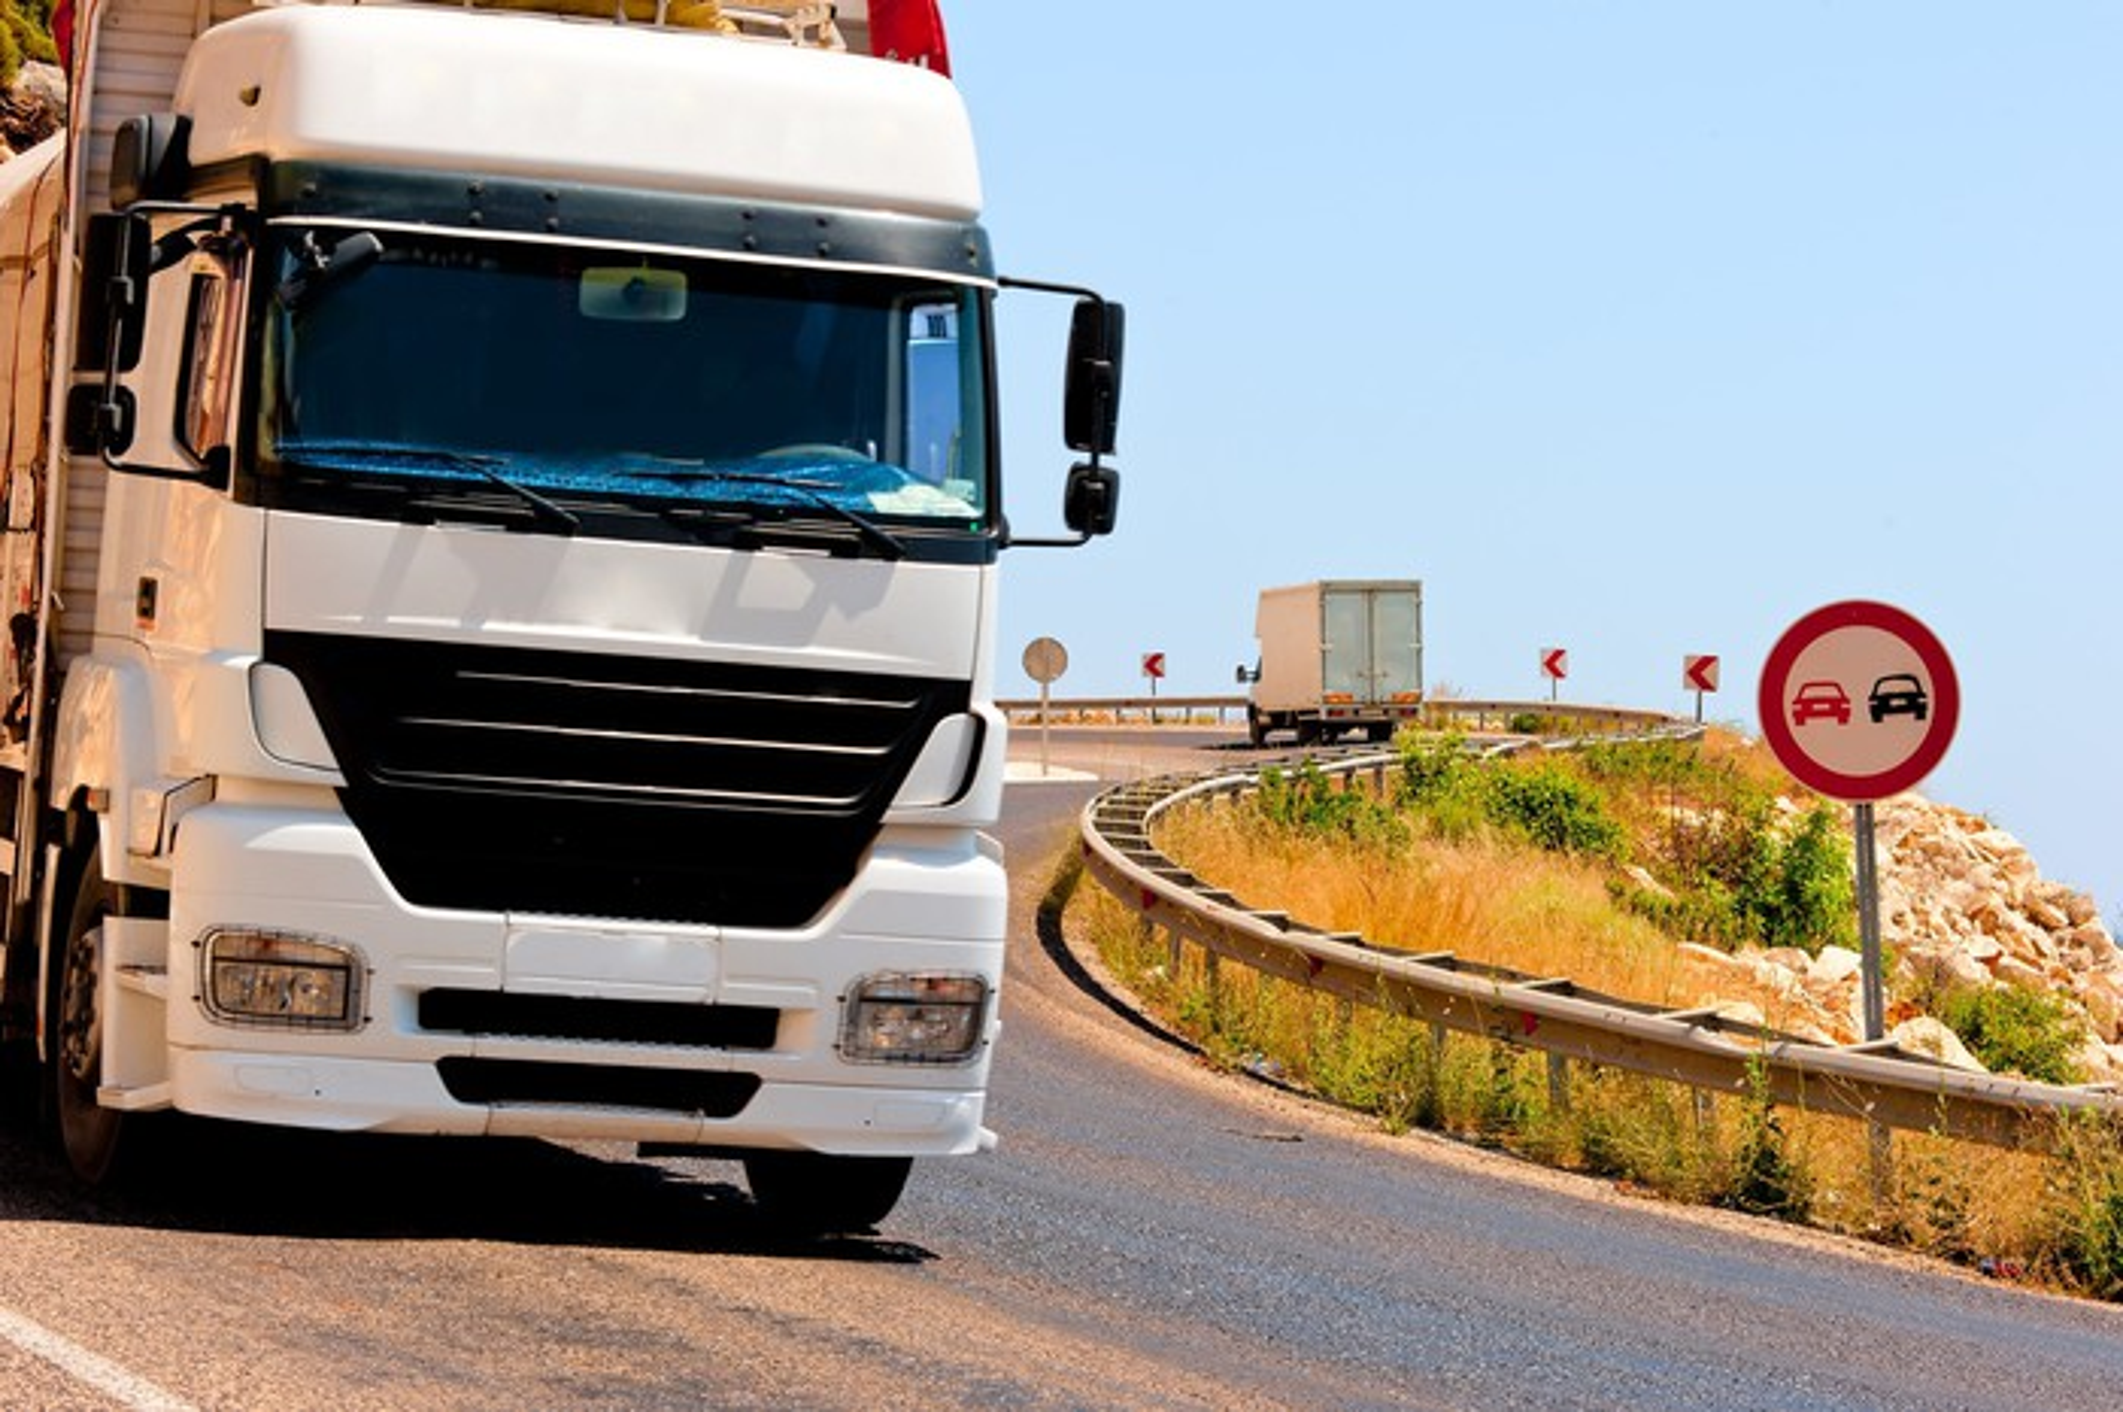 Truck driving downhill